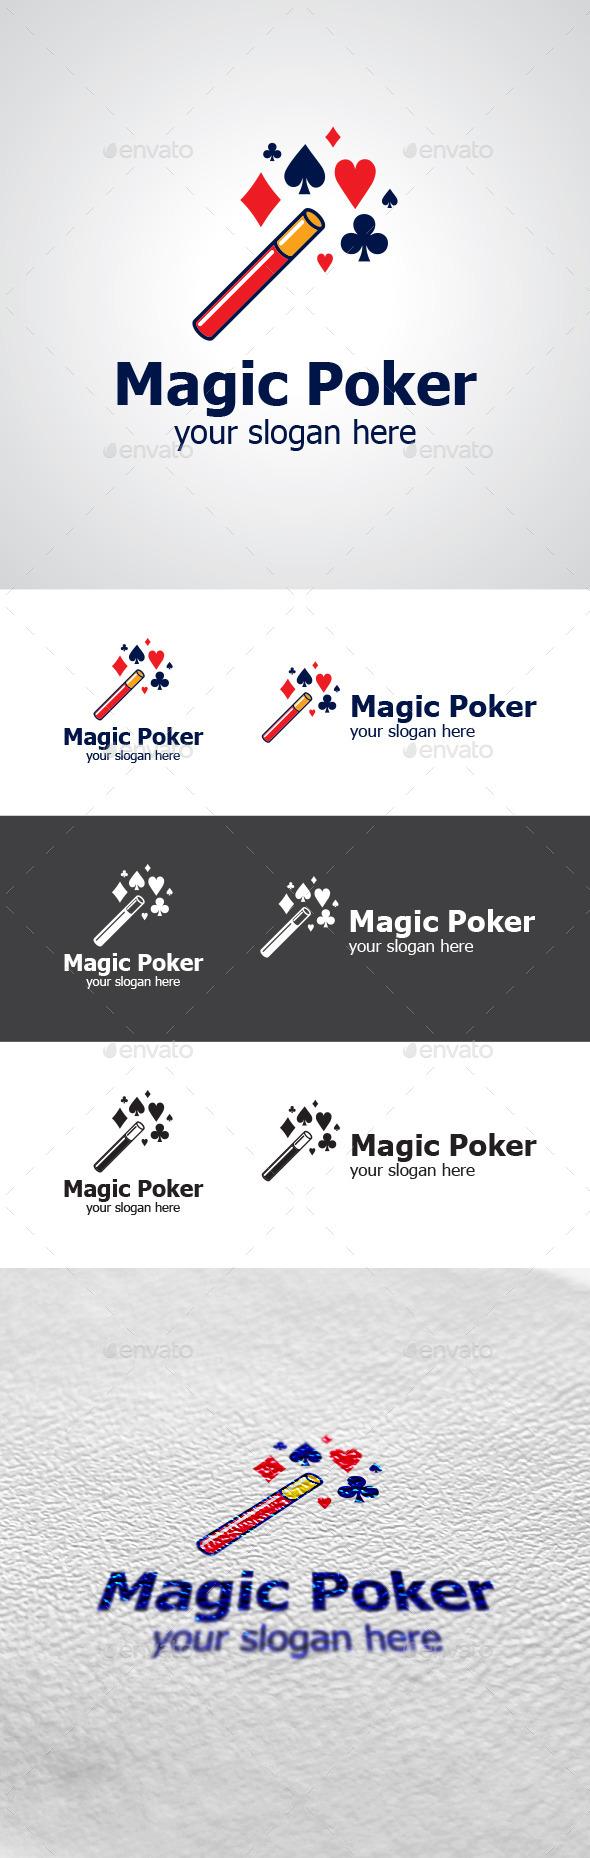 Magic Poker Logo Design